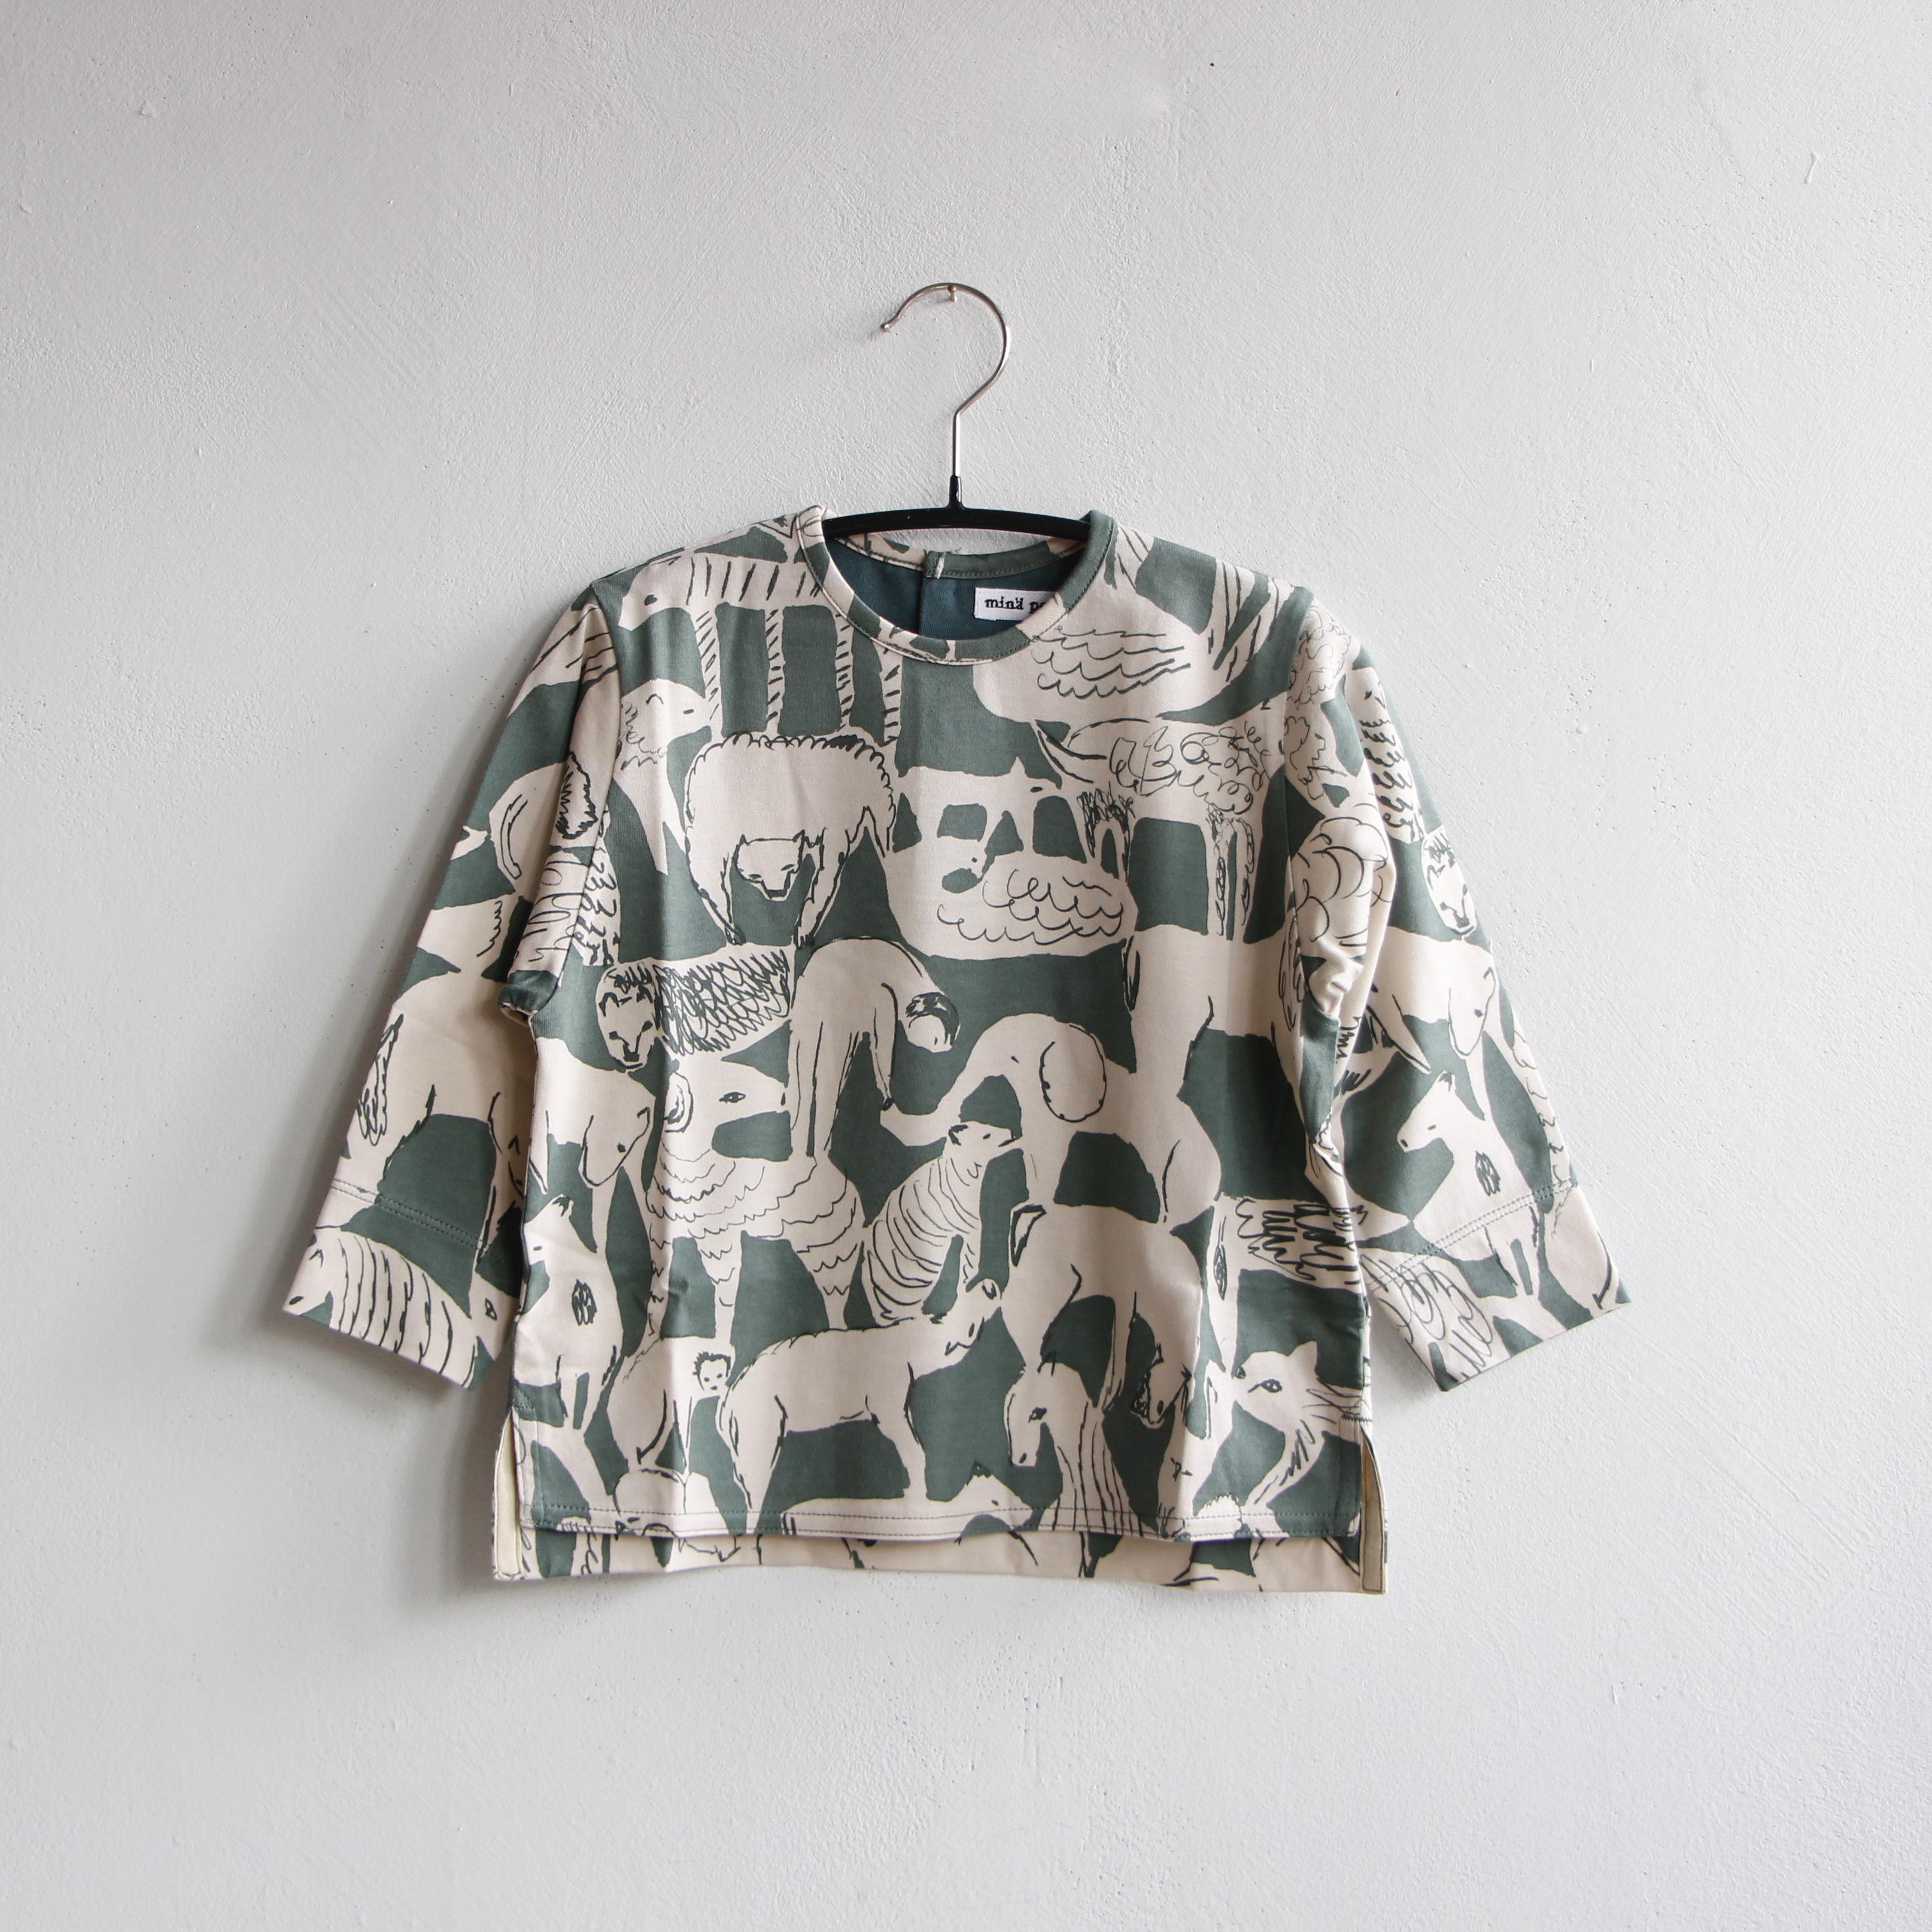 《mina perhonen 2020AW》life puzzle 長袖カットソー / moss green / 110-140cm